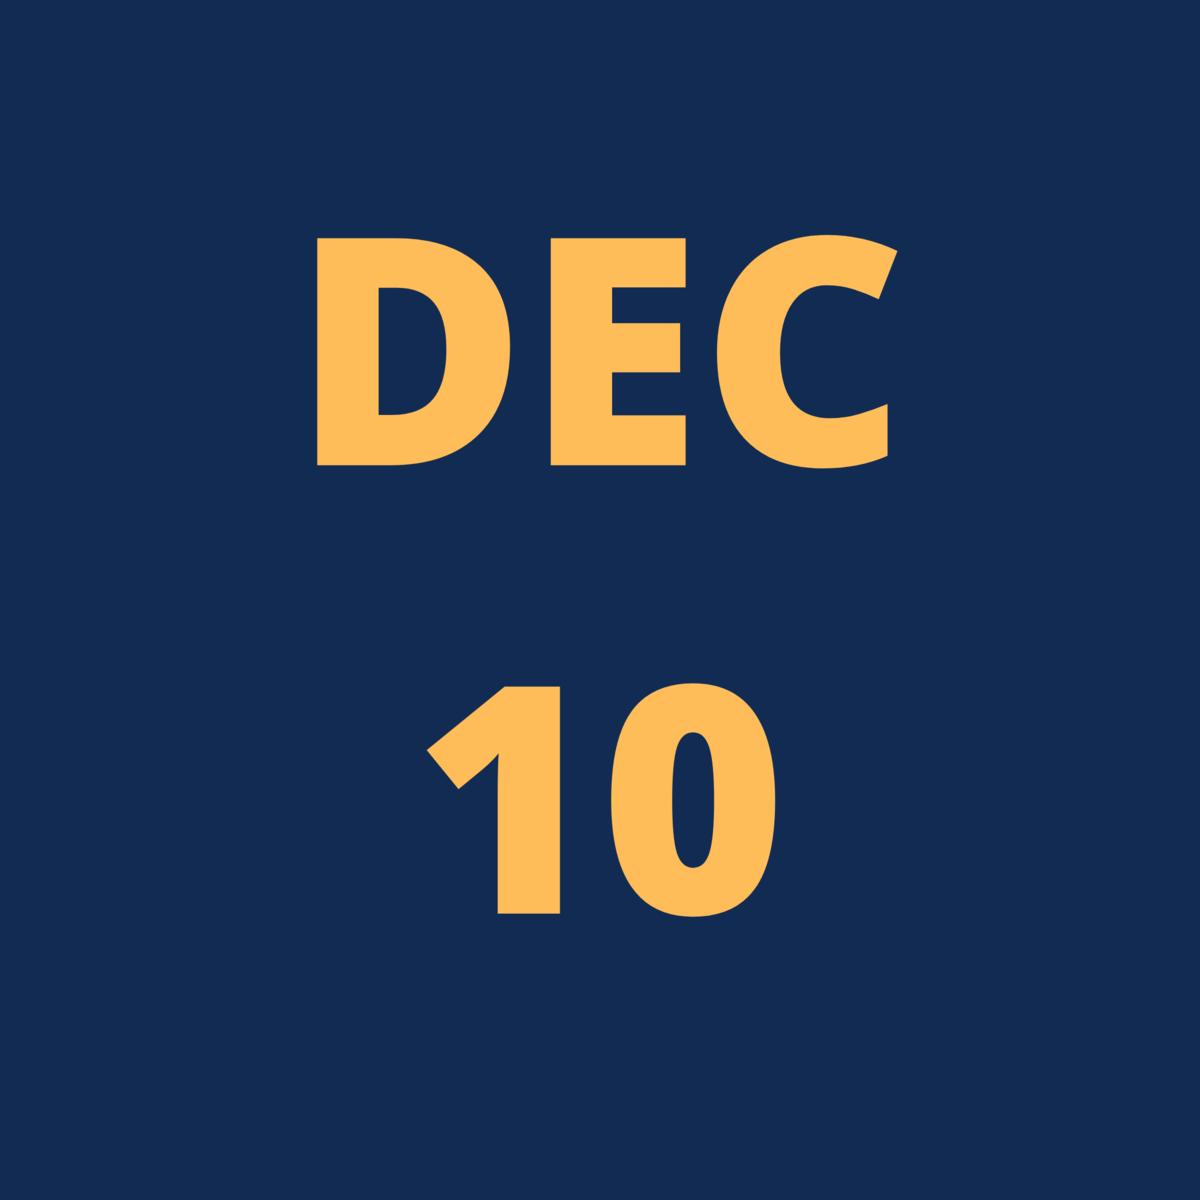 Dec 10 Icon